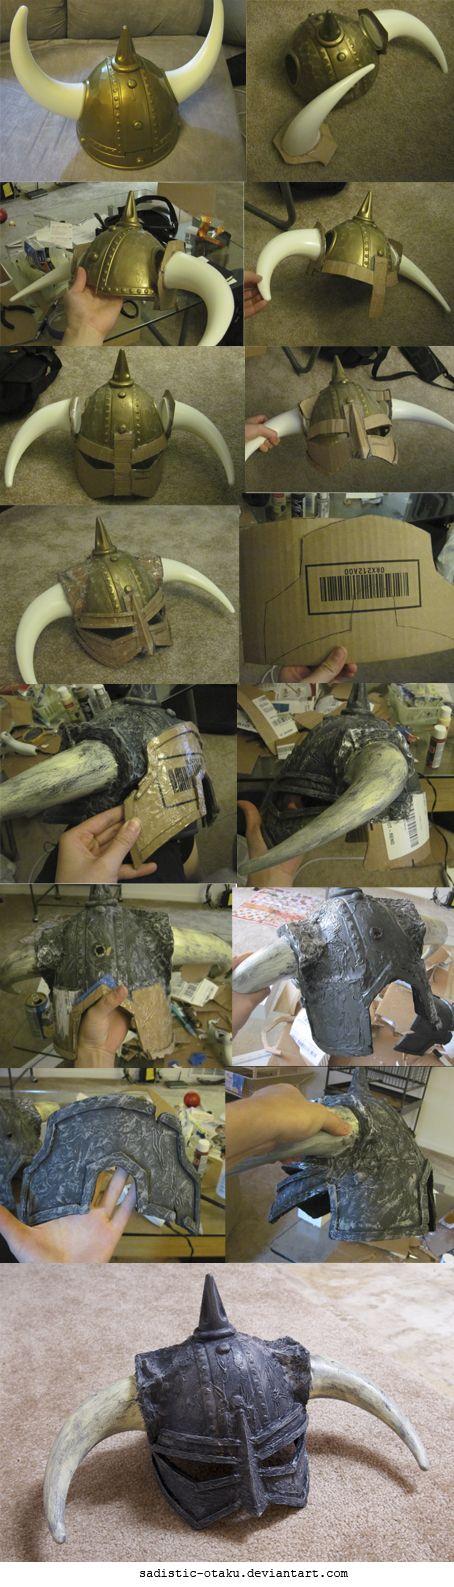 Skyrim Helmet Progress by Sadistic-Otaku.deviantart.com